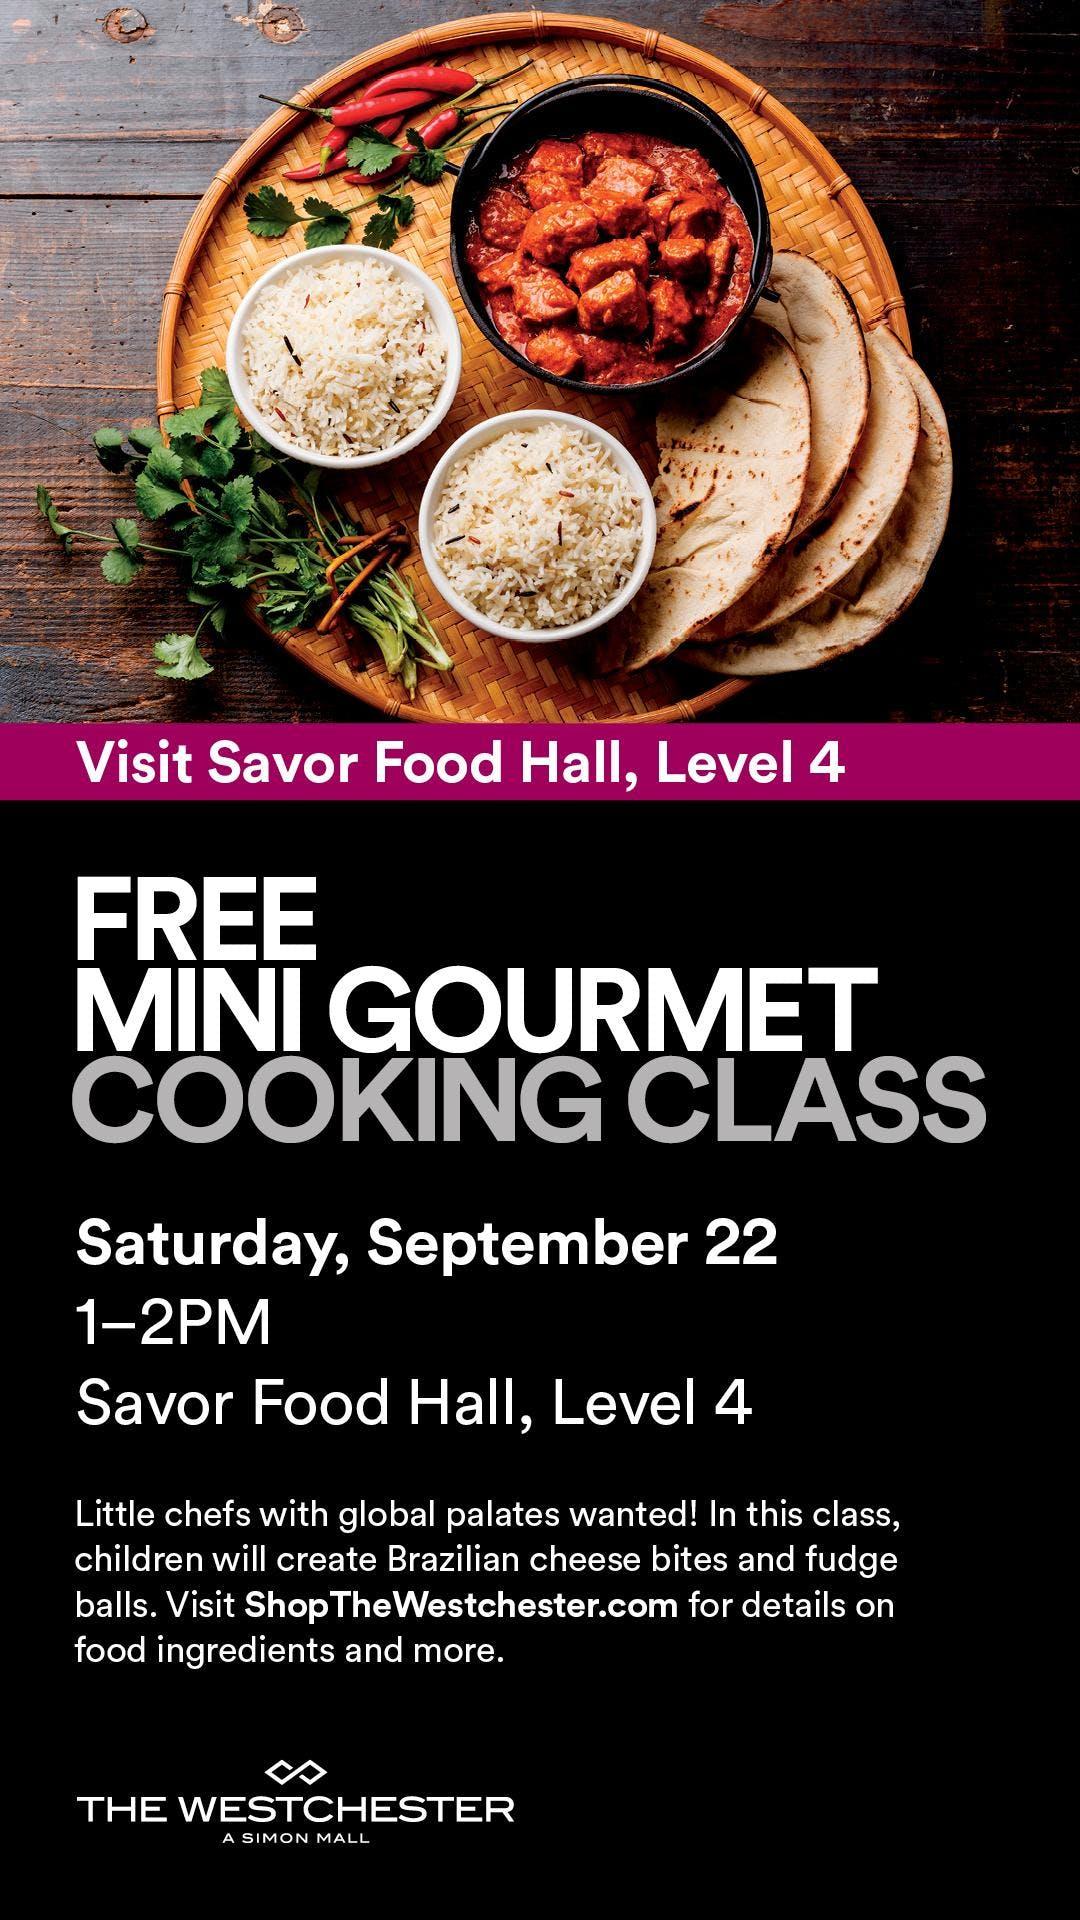 FREE Mini Gourmet Cooking Class